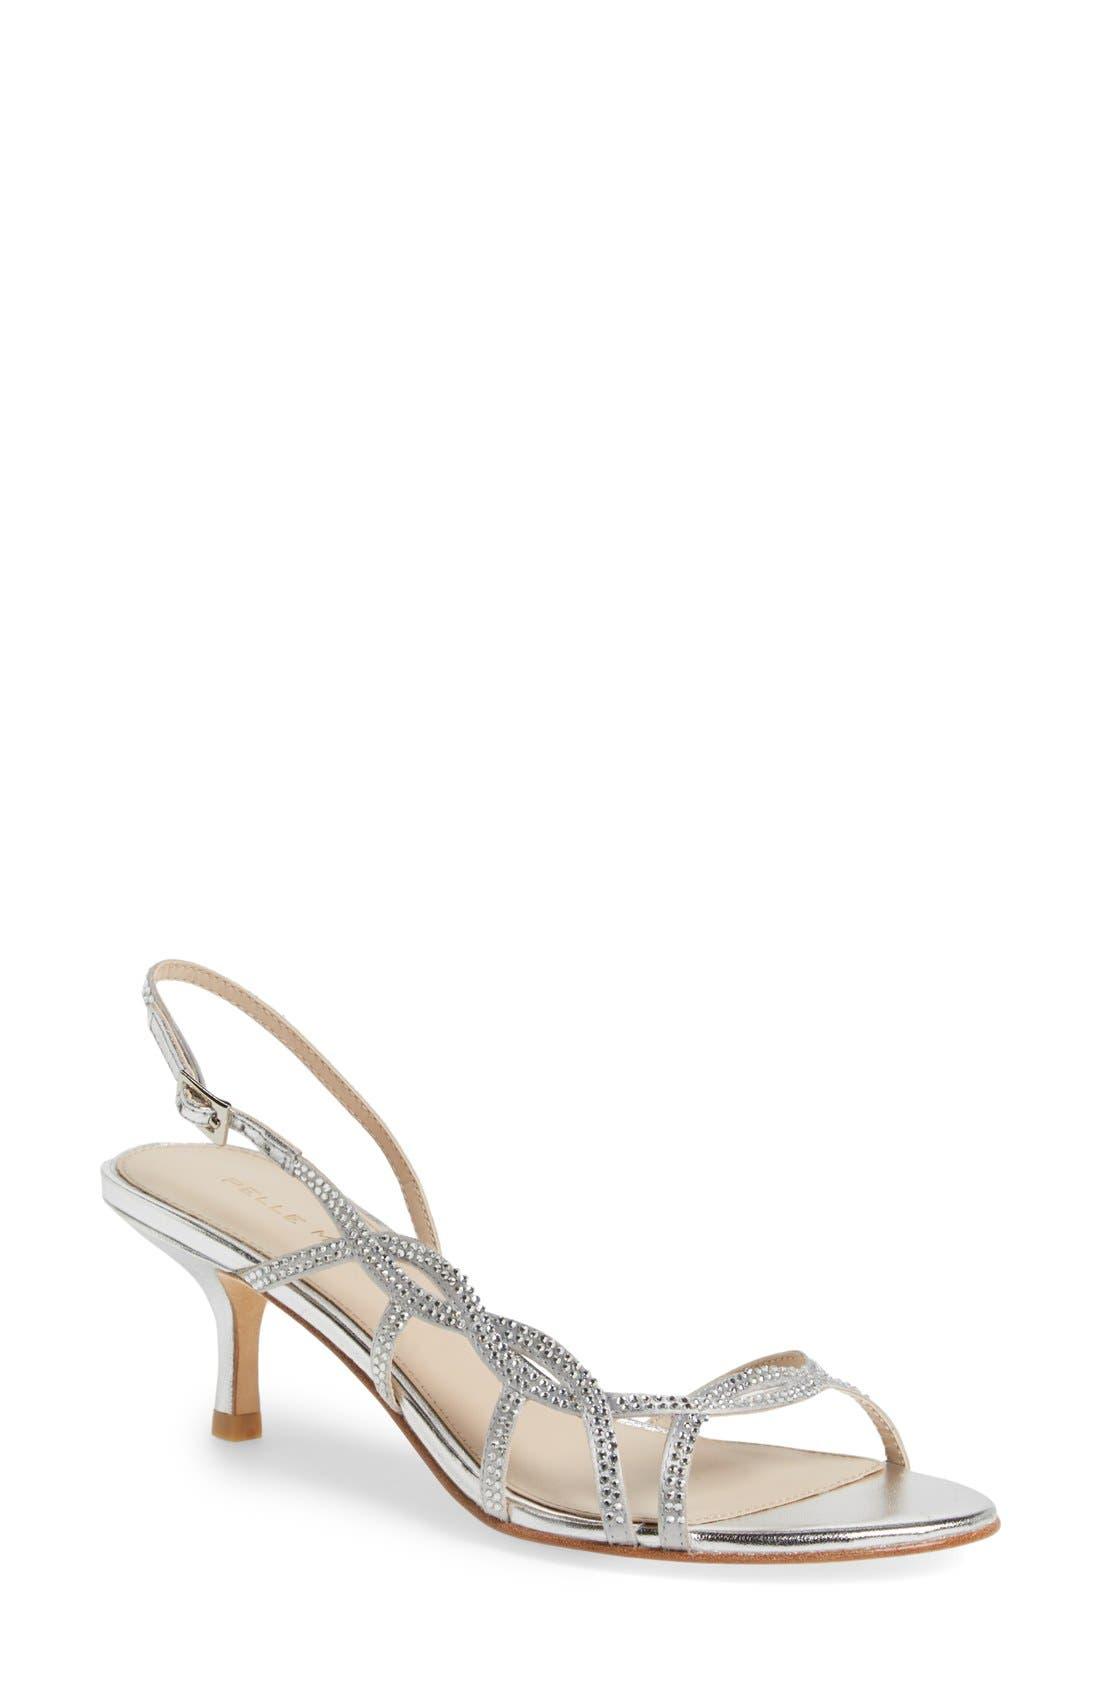 Main Image - Pelle Moda 'Amina' Metallic Slingback Sandal (Women)